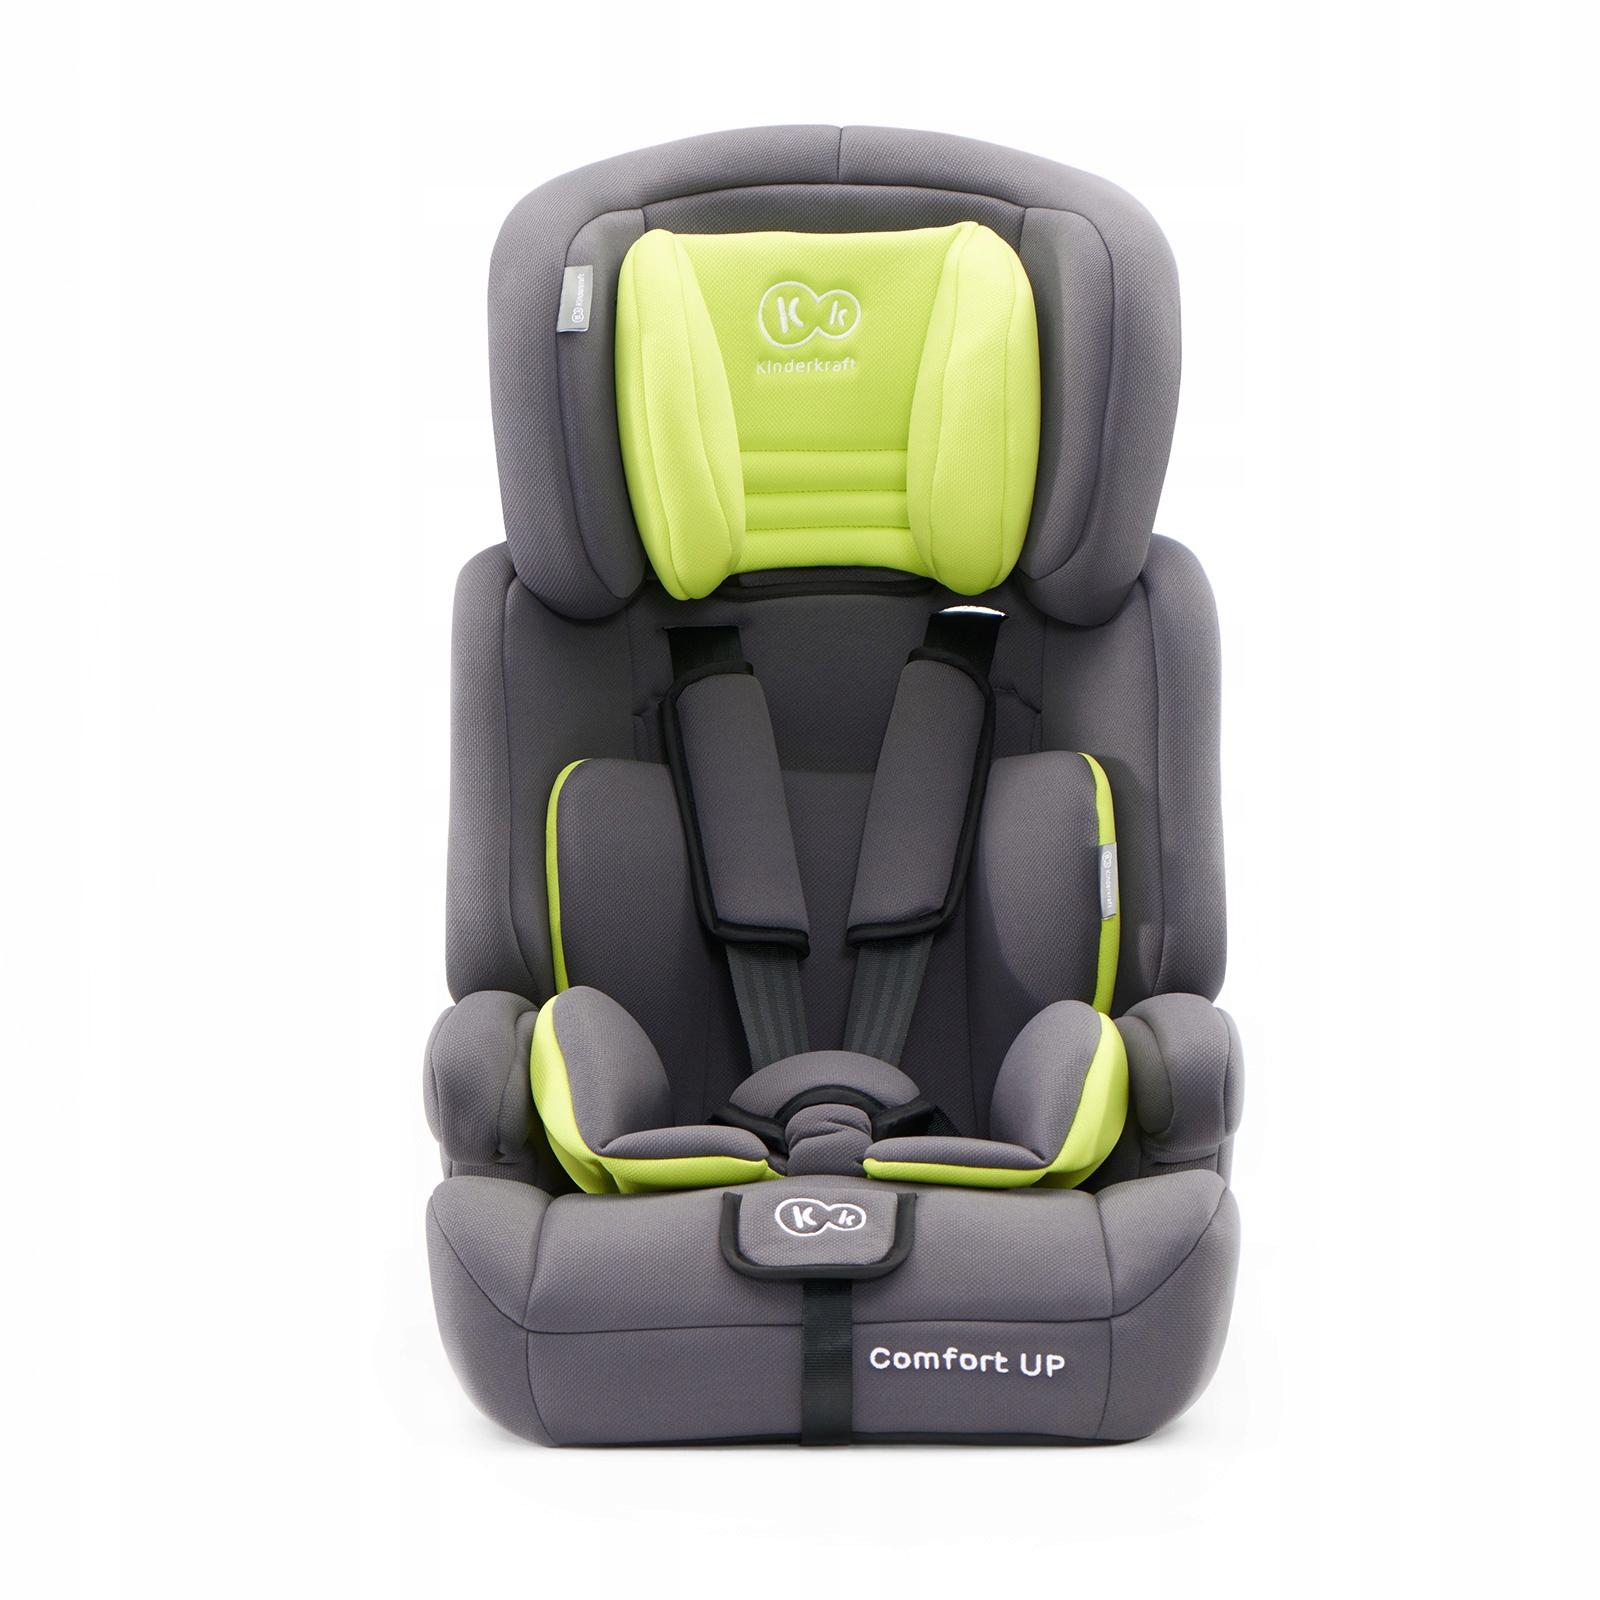 Fotelik samochodowy 9-36 kg Kinderkraft COMFORT UP Producent Kinderkraft